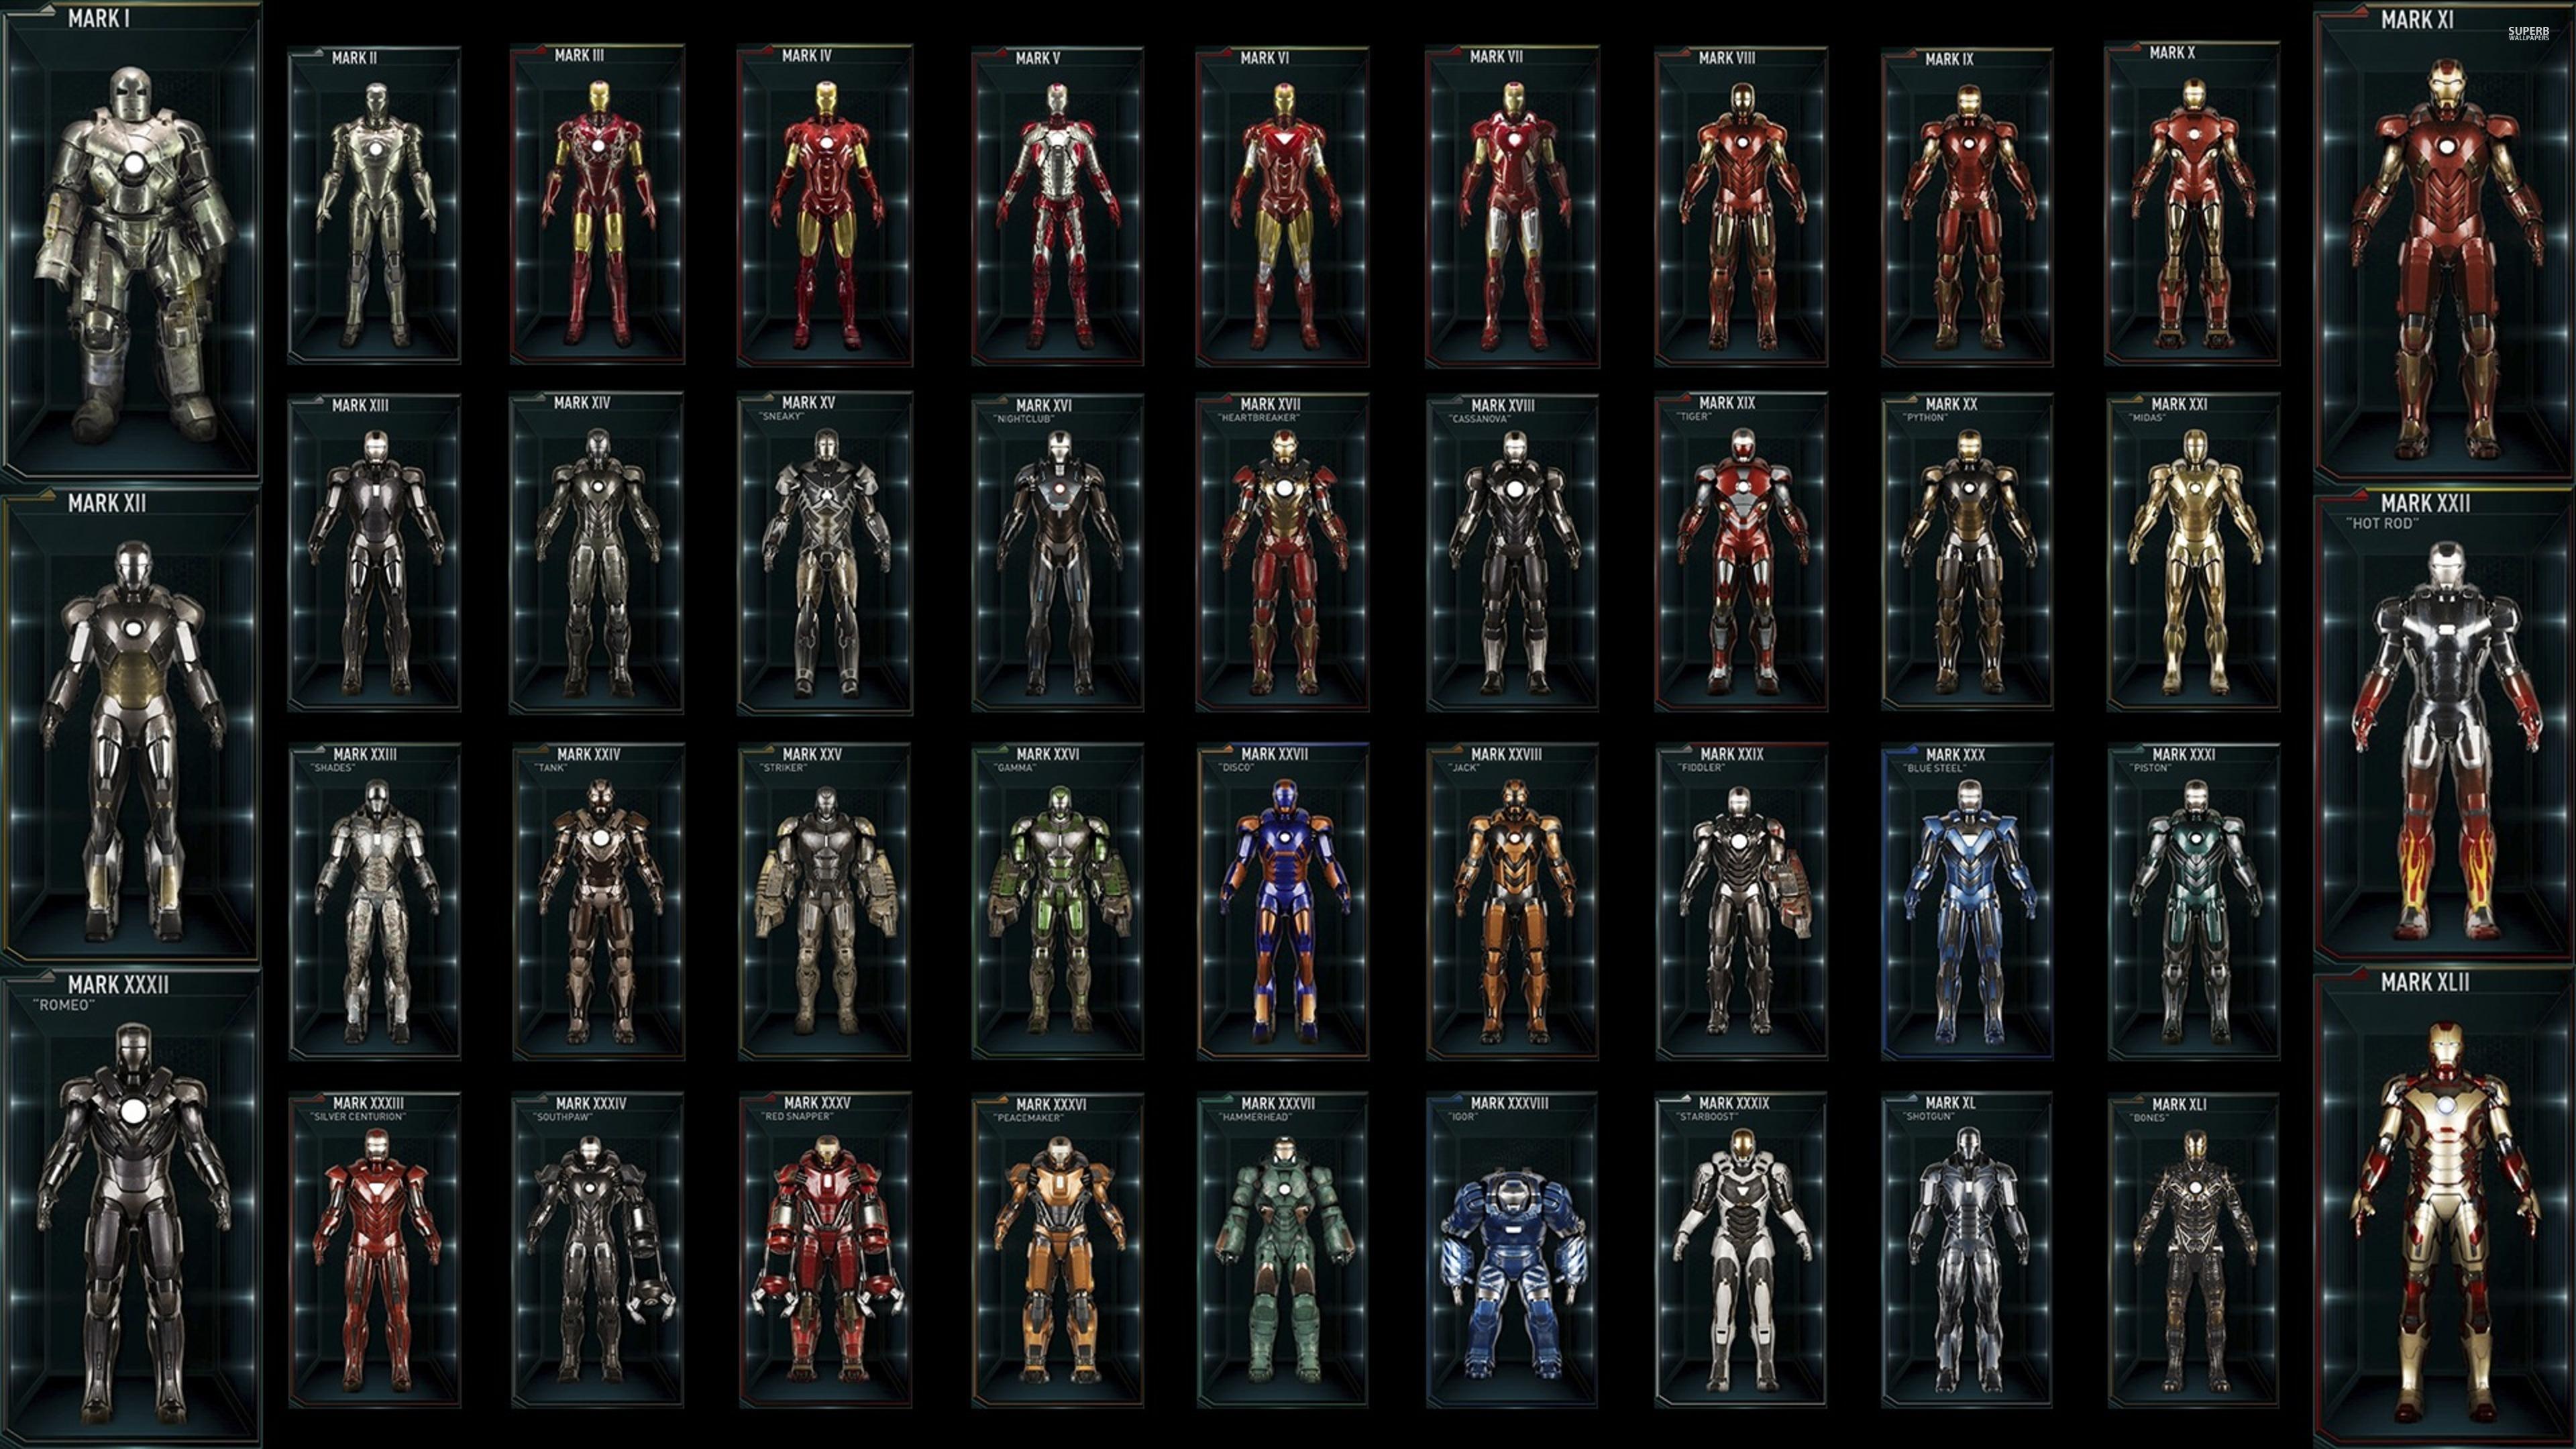 iron-man-suits-29382-3840x2160